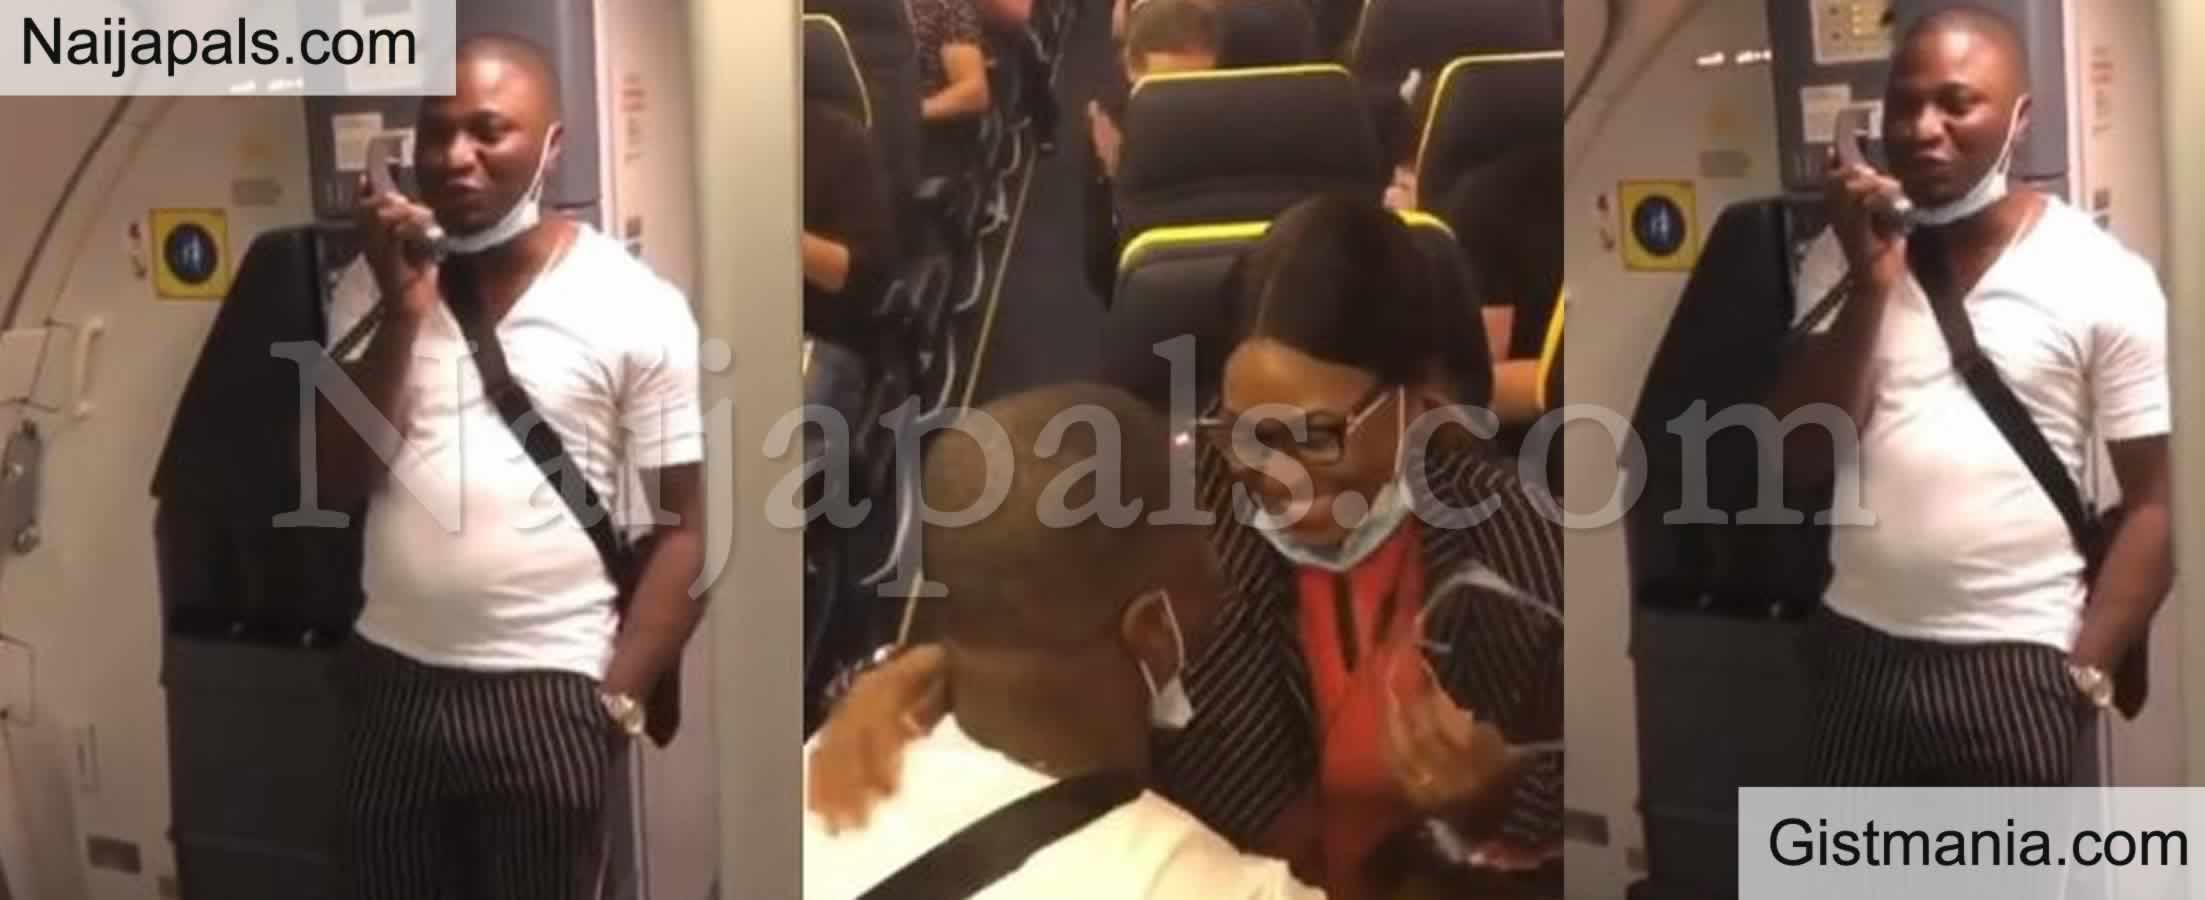 <img alt='.' class='lazyload' data-src='https://img.gistmania.com/emot/video.gif' /> <b>Romantic Moment A Nigerian Man Proposed To His Girlfriend Onboard An International Flight</b> (VID)